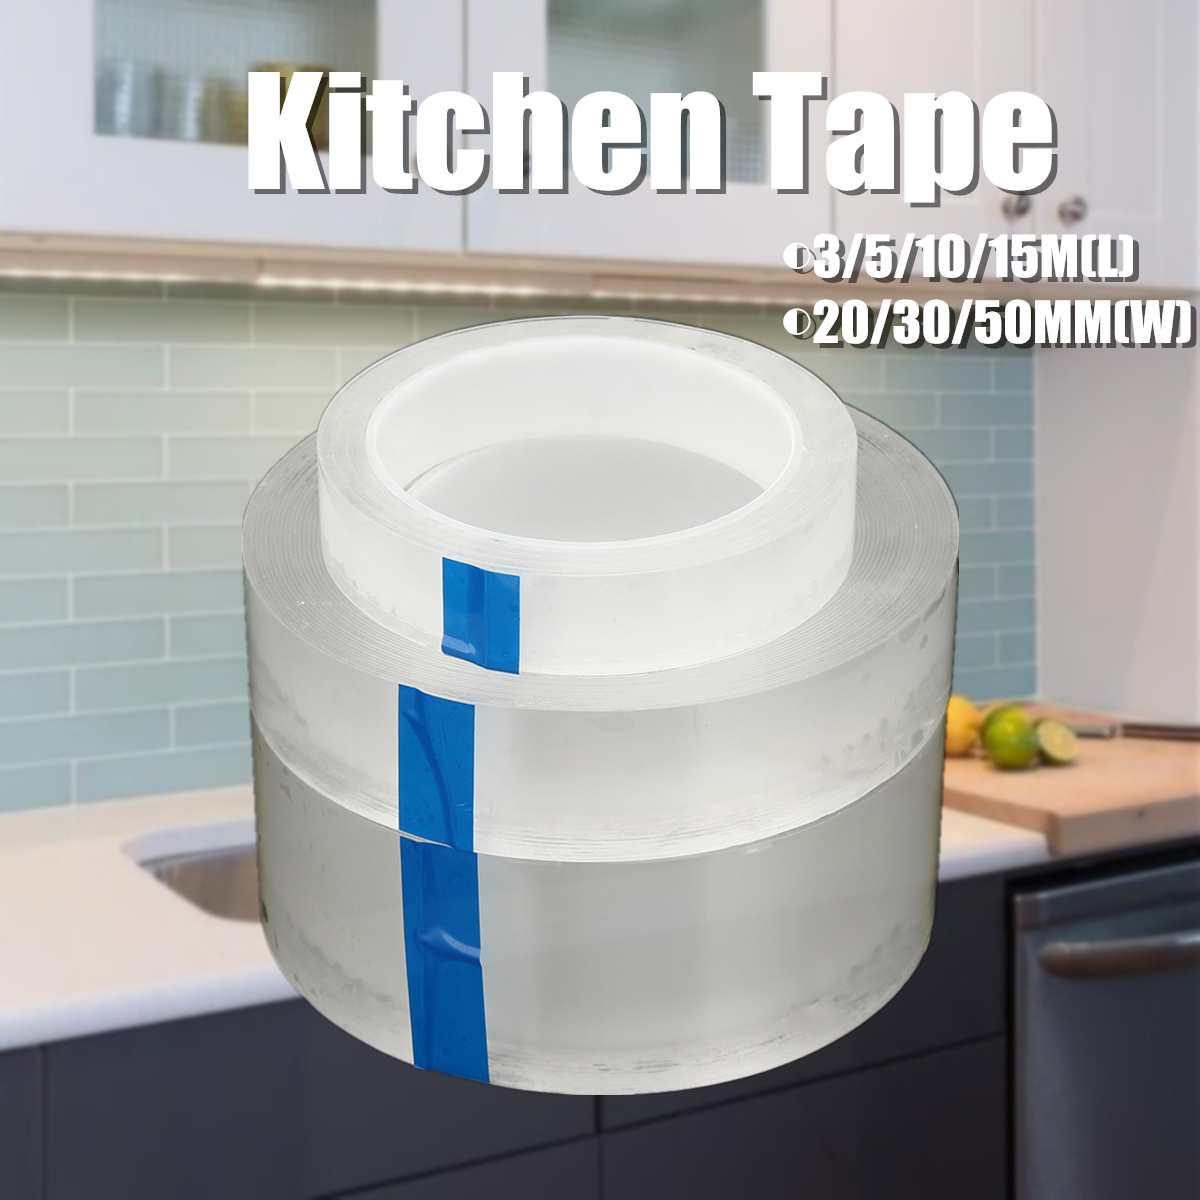 Waterproof Self Adhesive Kitchen Tape Bathroom Wall Sealing Tape Mildew Proof Toilet Wall Corner Line Sink Sealing Stickers